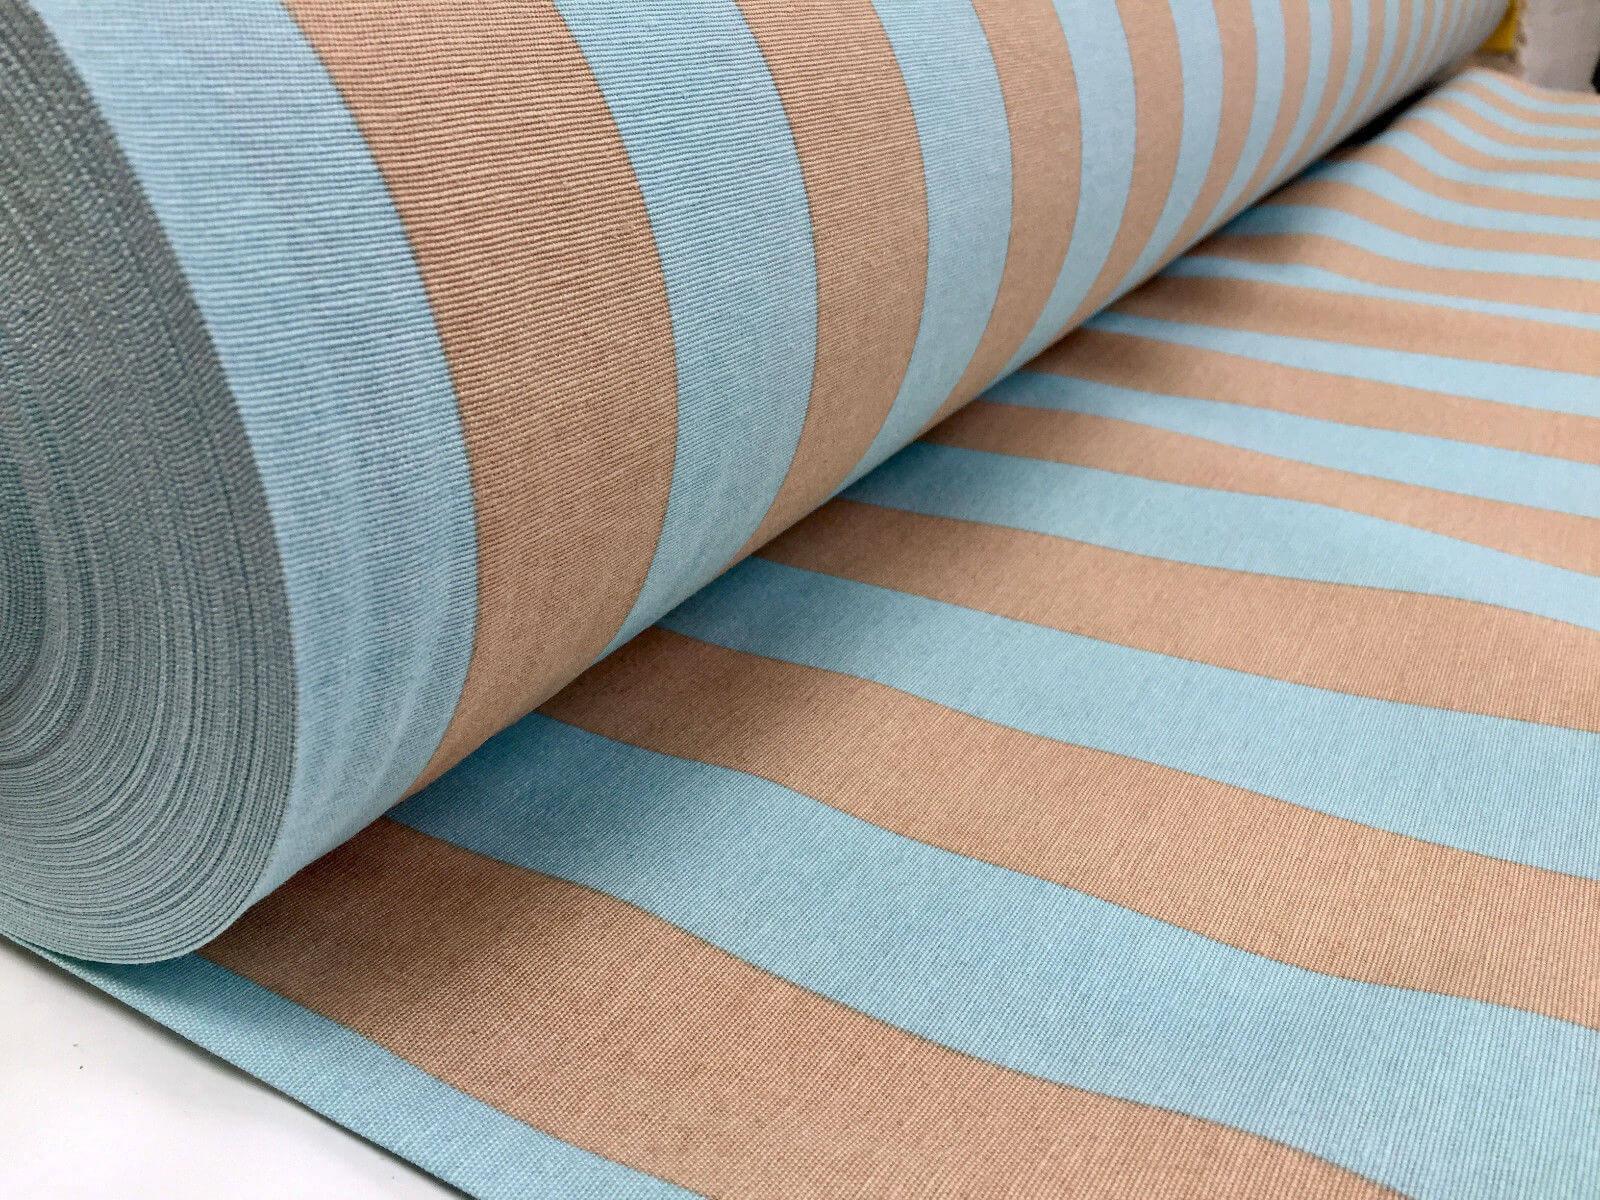 aqua-beige-stripe-fabric-sofia-stripes-curtain-upholstery-striped-material-140cm-wide-5aad4d101.jpg